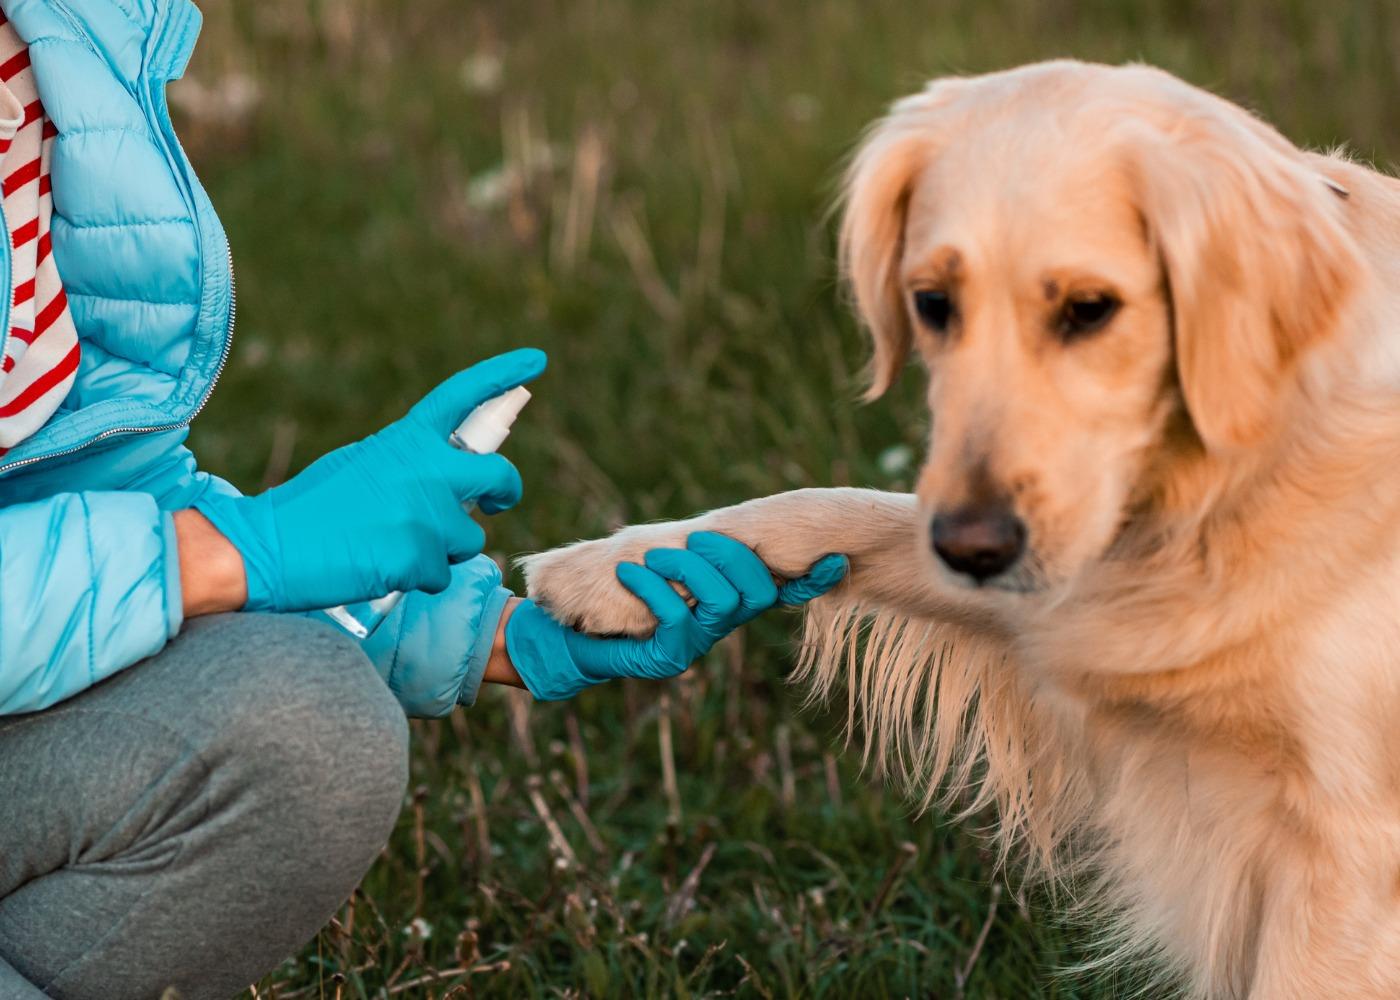 Mulher a higienizar cão